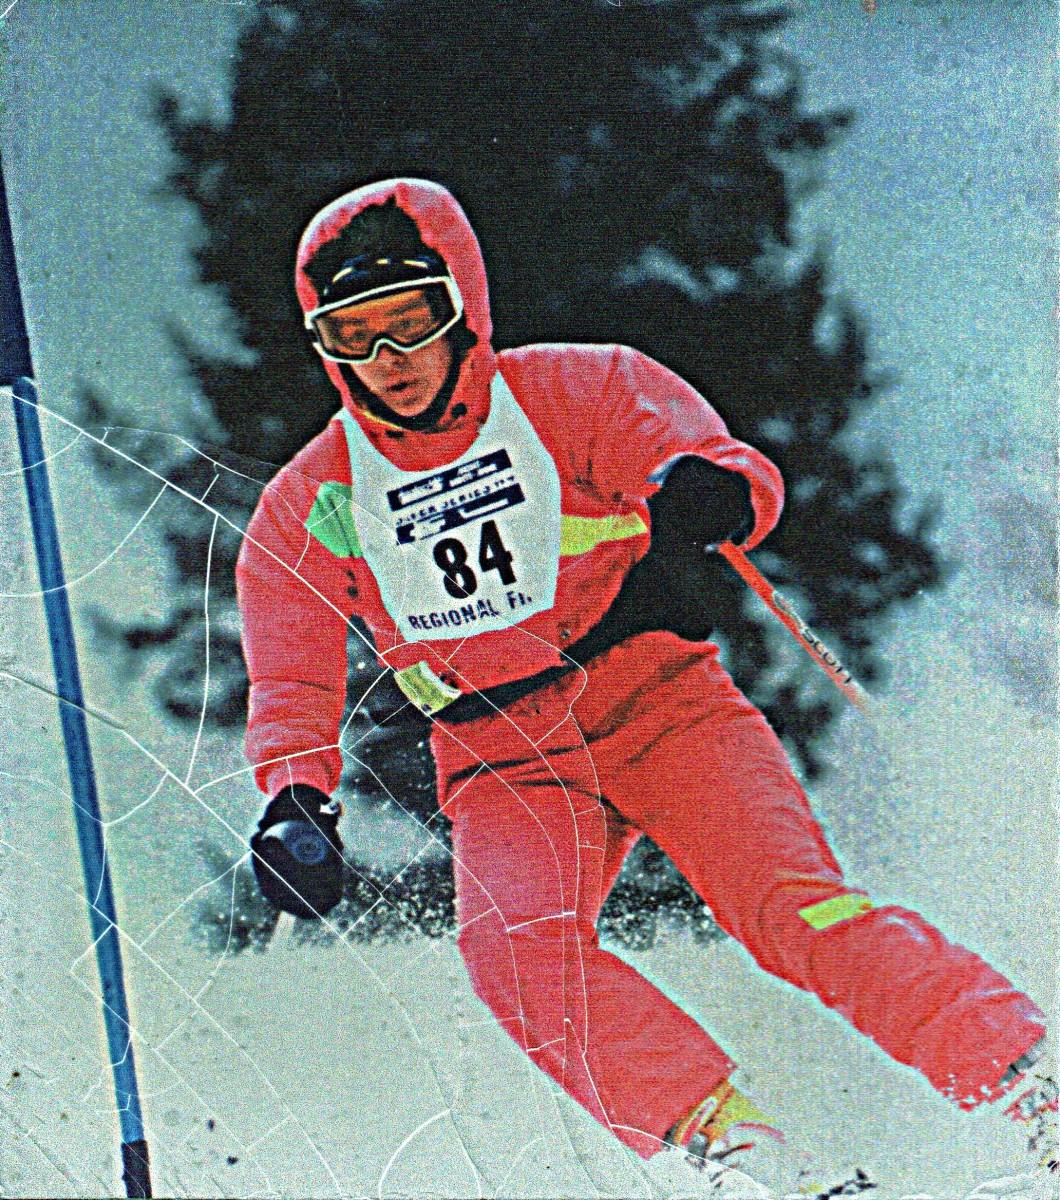 Author at Hunter Mountain amateur ski race.